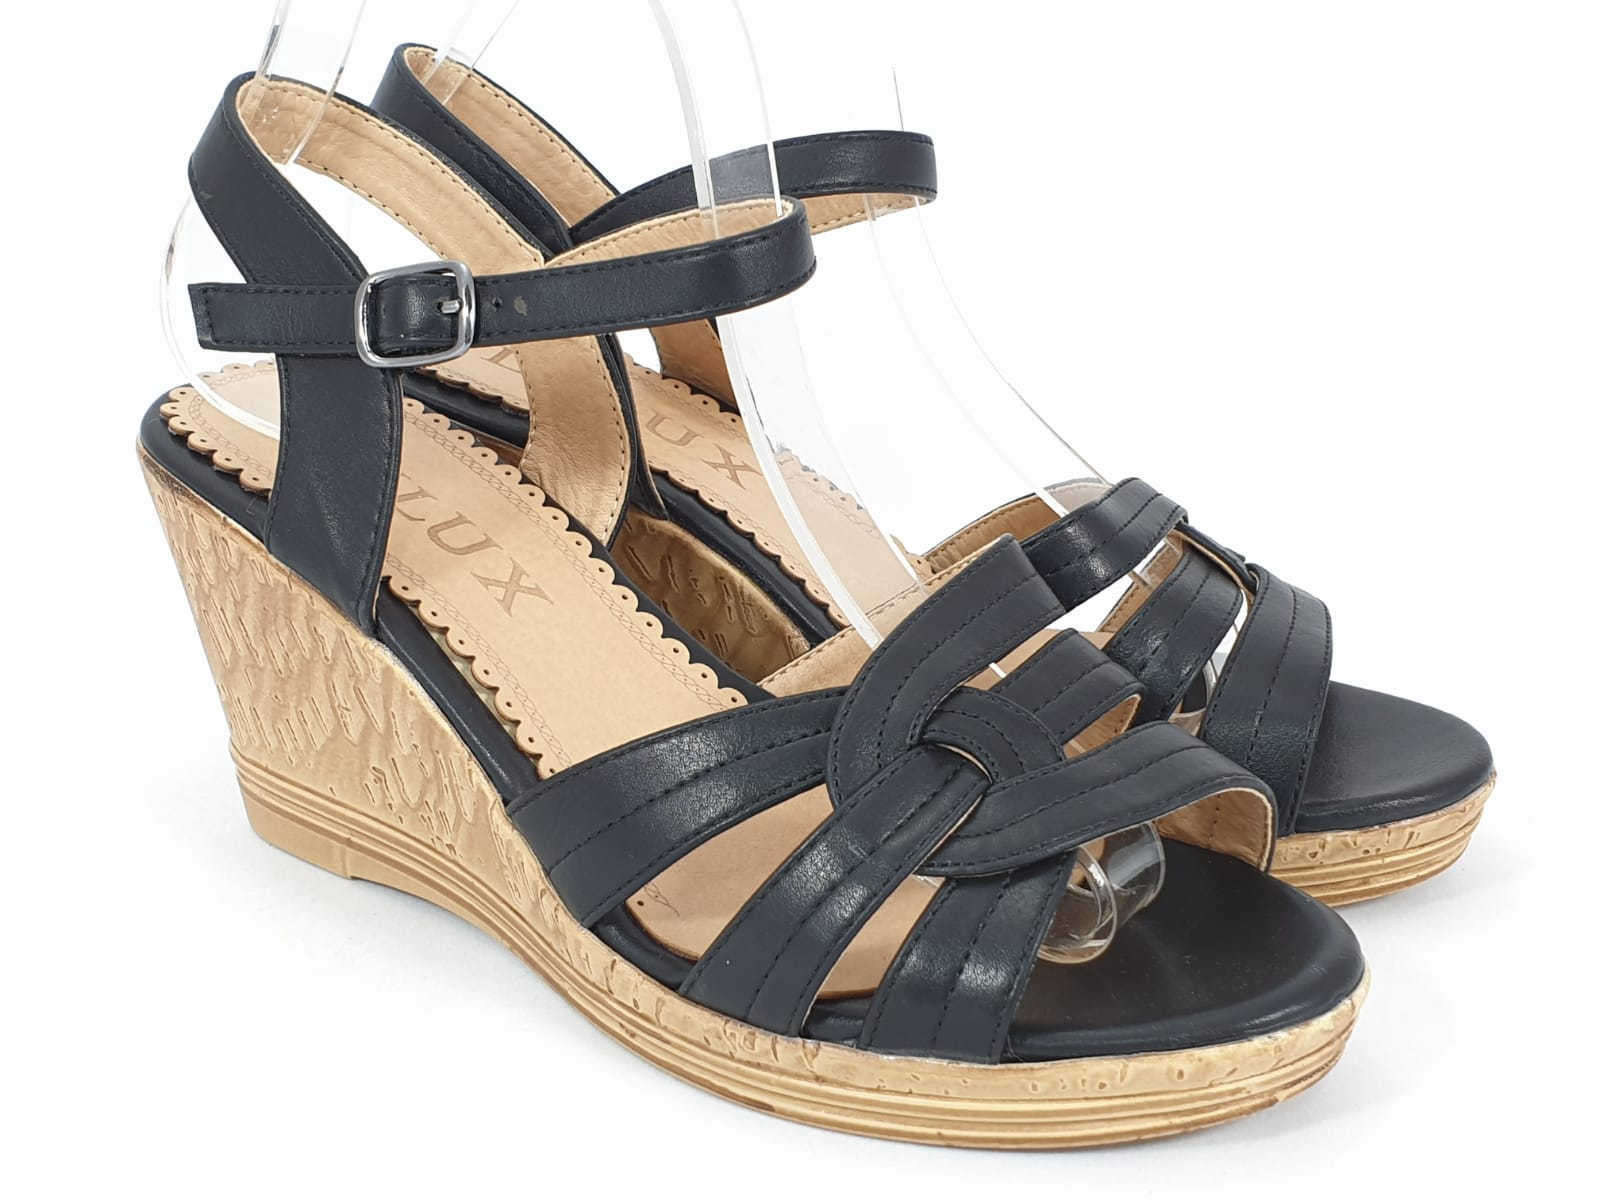 Sandale dama negre Lori